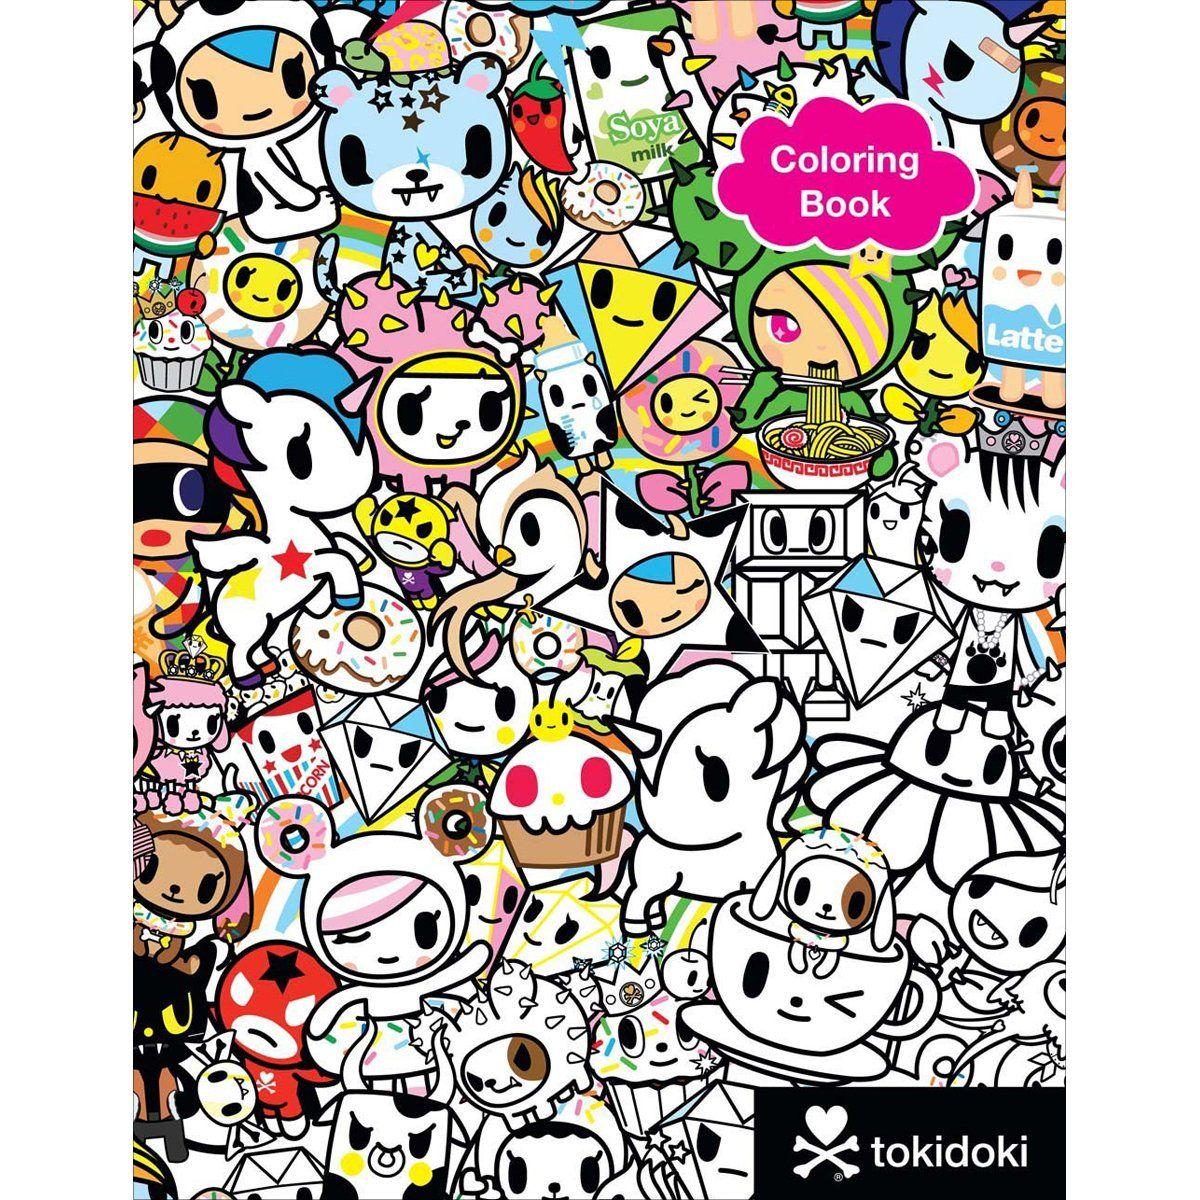 Shop Tokidoki Coloring Book At Artsy Sister In 2021 Sketch Book Coloring Books Hardcover Book